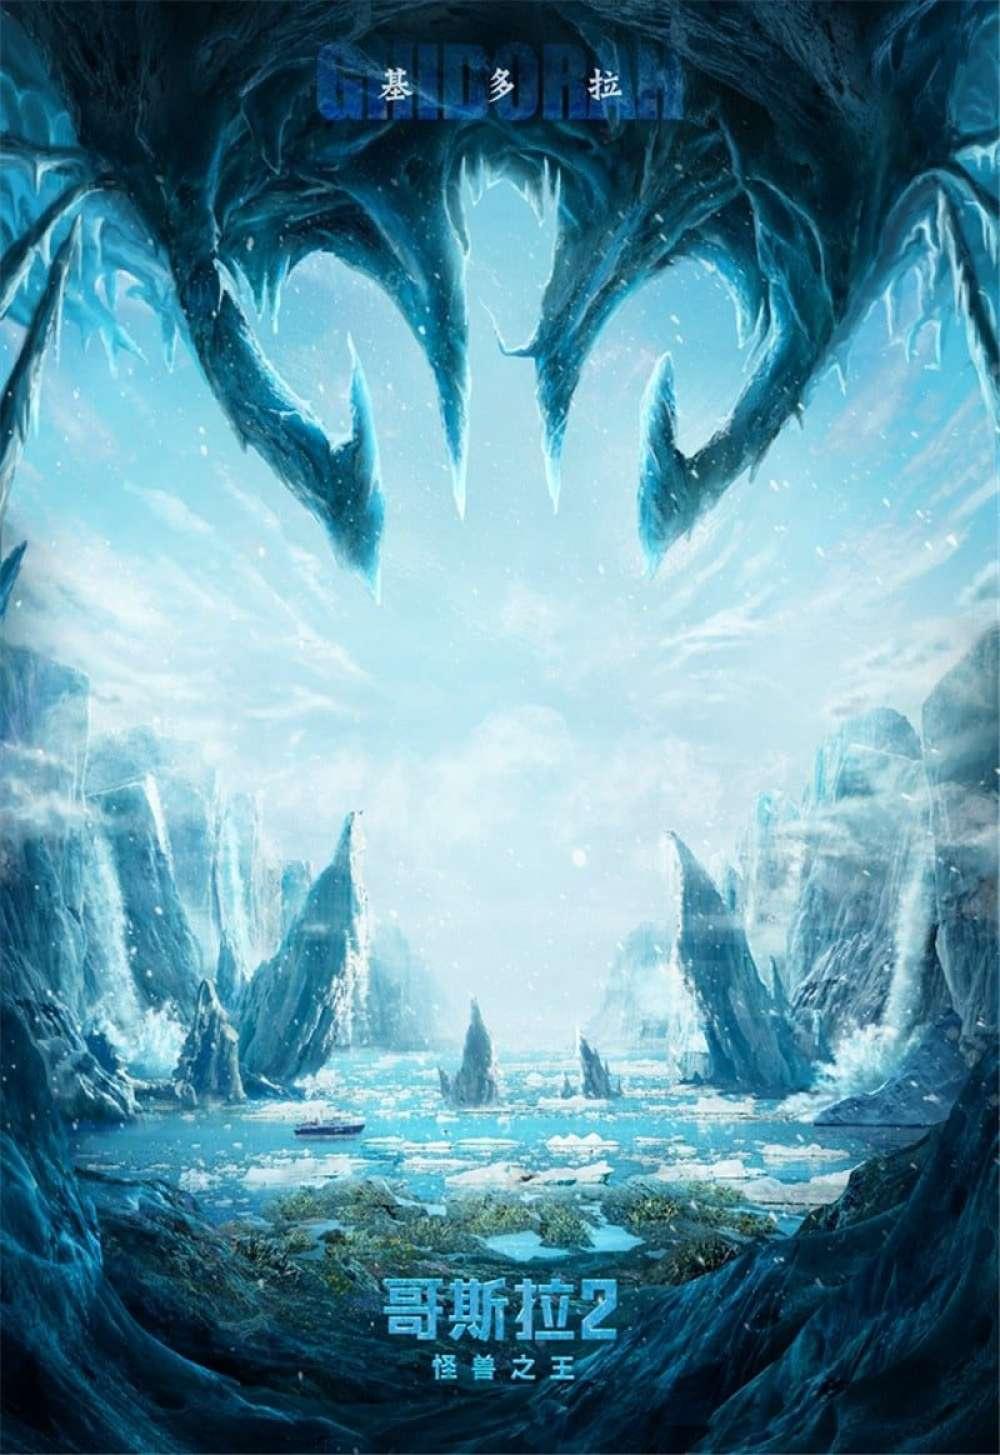 Godzilla king monsters poster 3